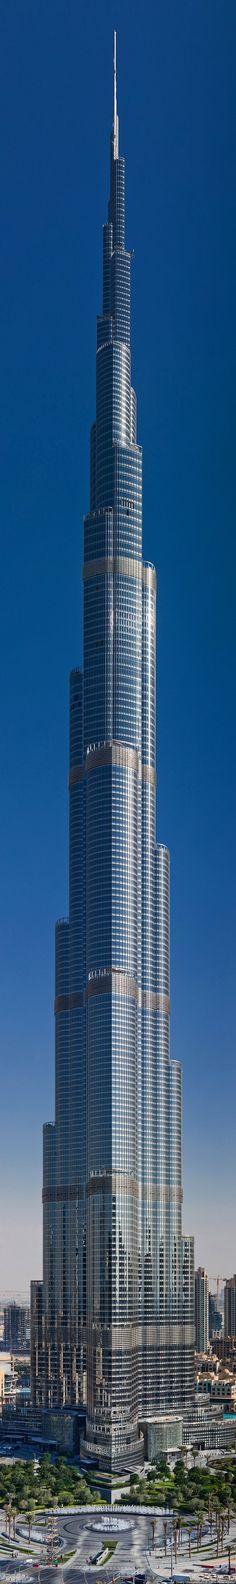 Burj Khalifa - amazing dimensions, amazing picture